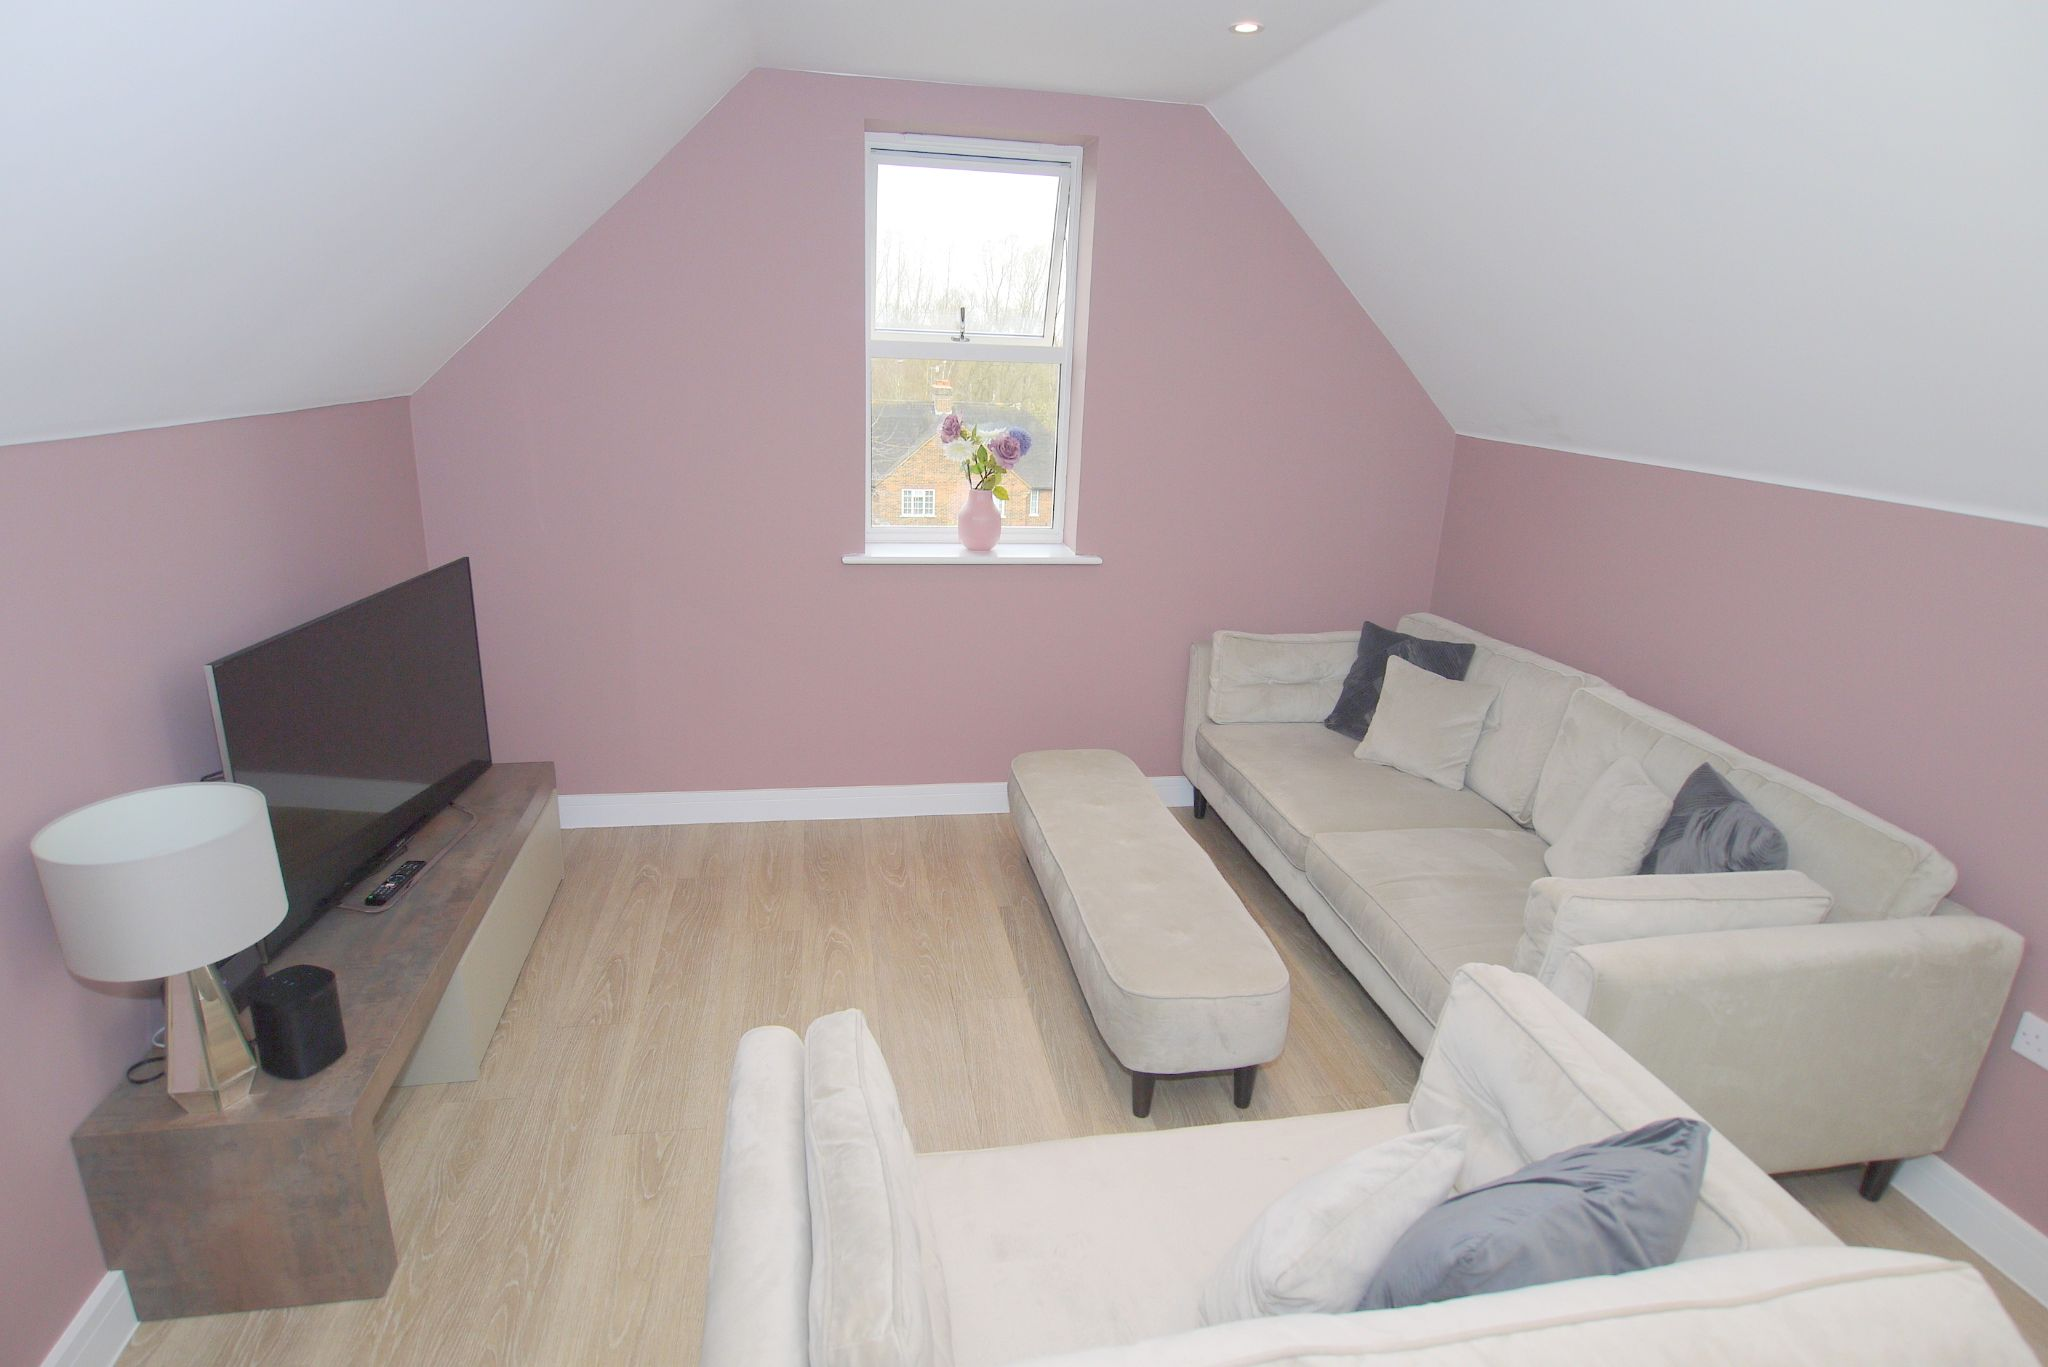 2 bedroom apartment Sale Agreed in Sevenoaks - Photograph 3